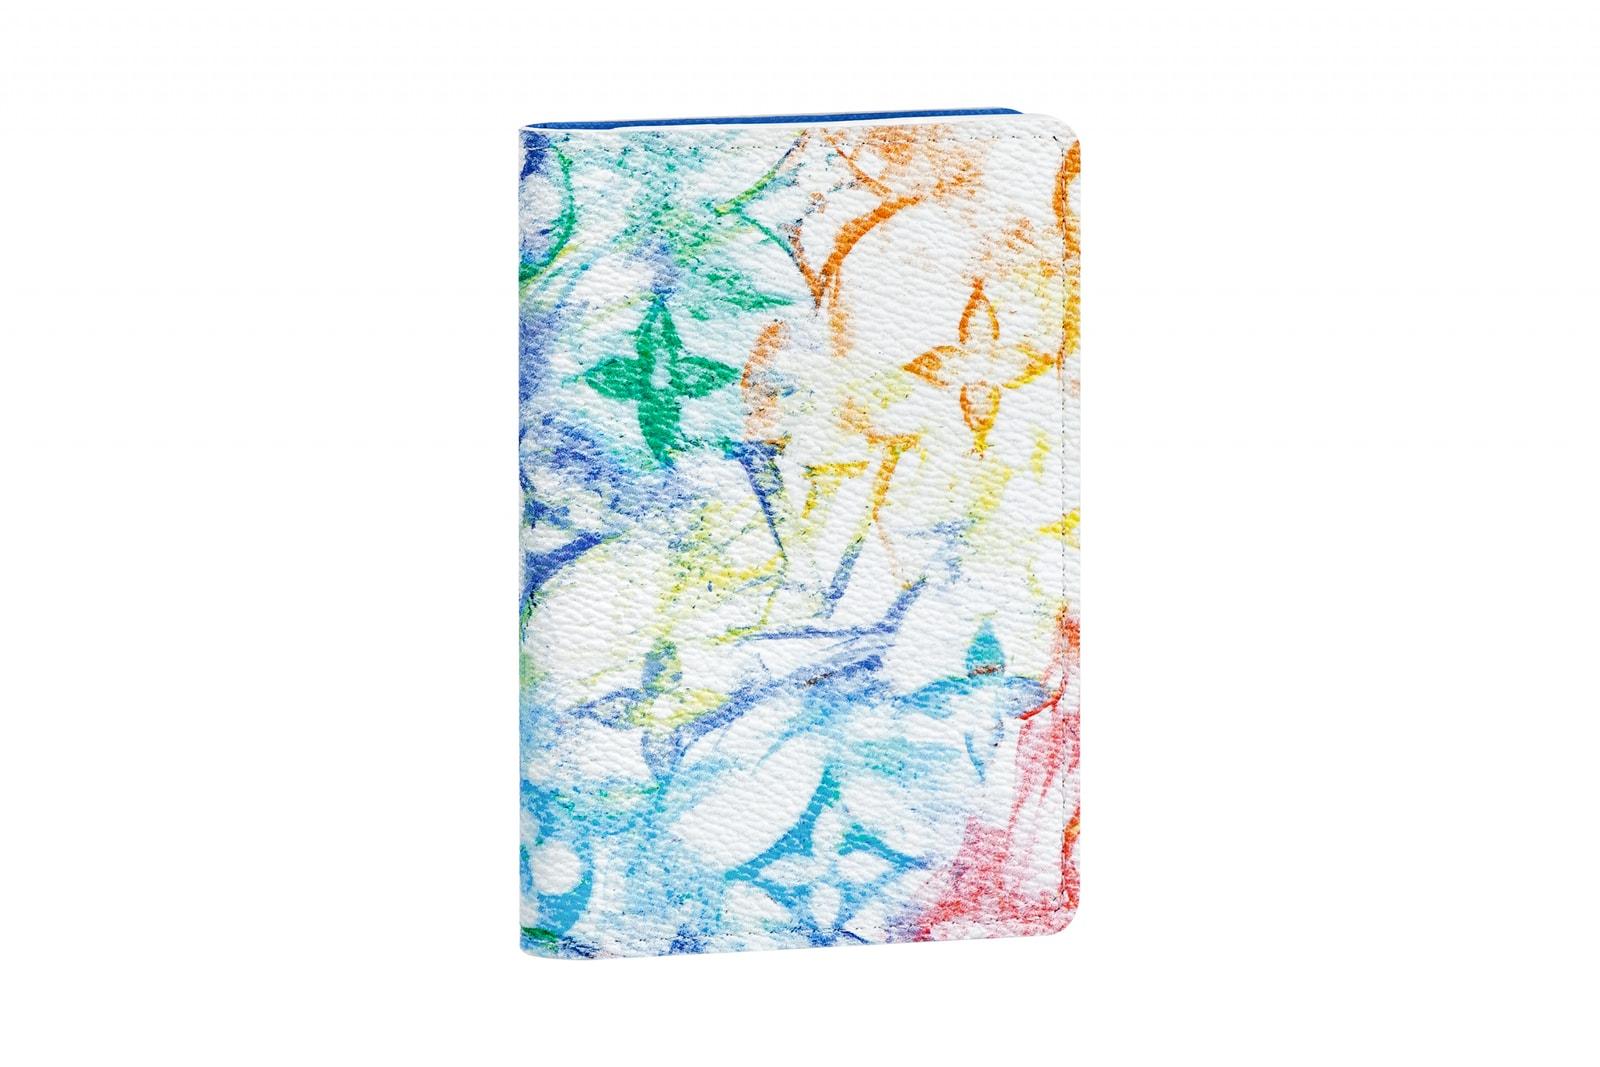 用時裝談人文價值,Louis Vuitton 初春「Monogram Pastel Color」系列